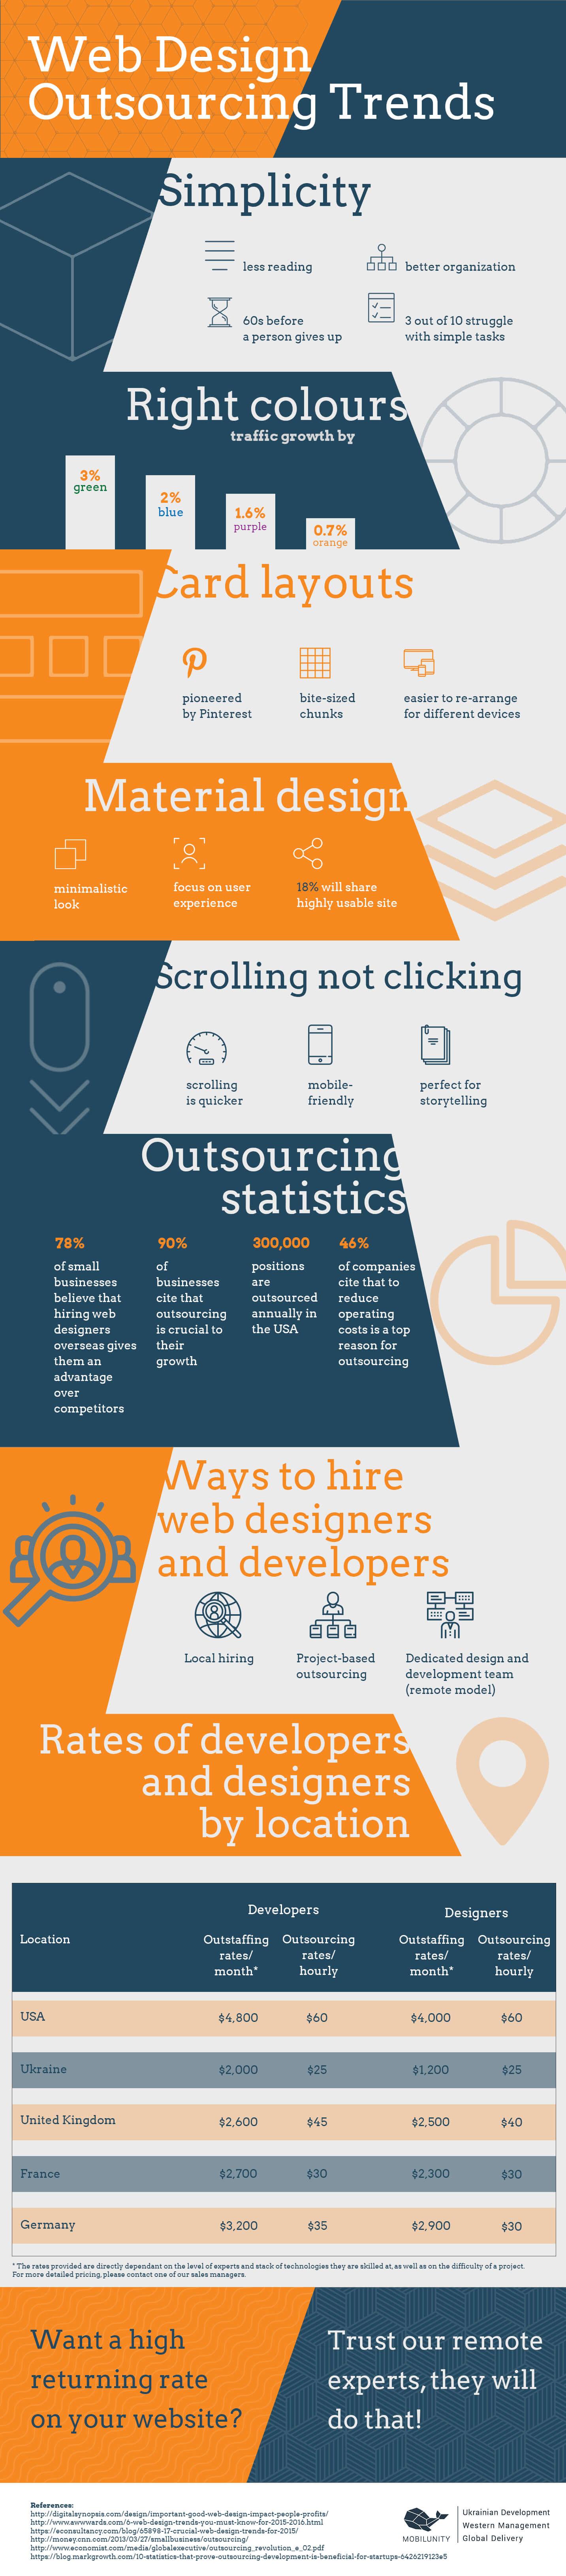 Web Design Outsourcing Ukraine Trends